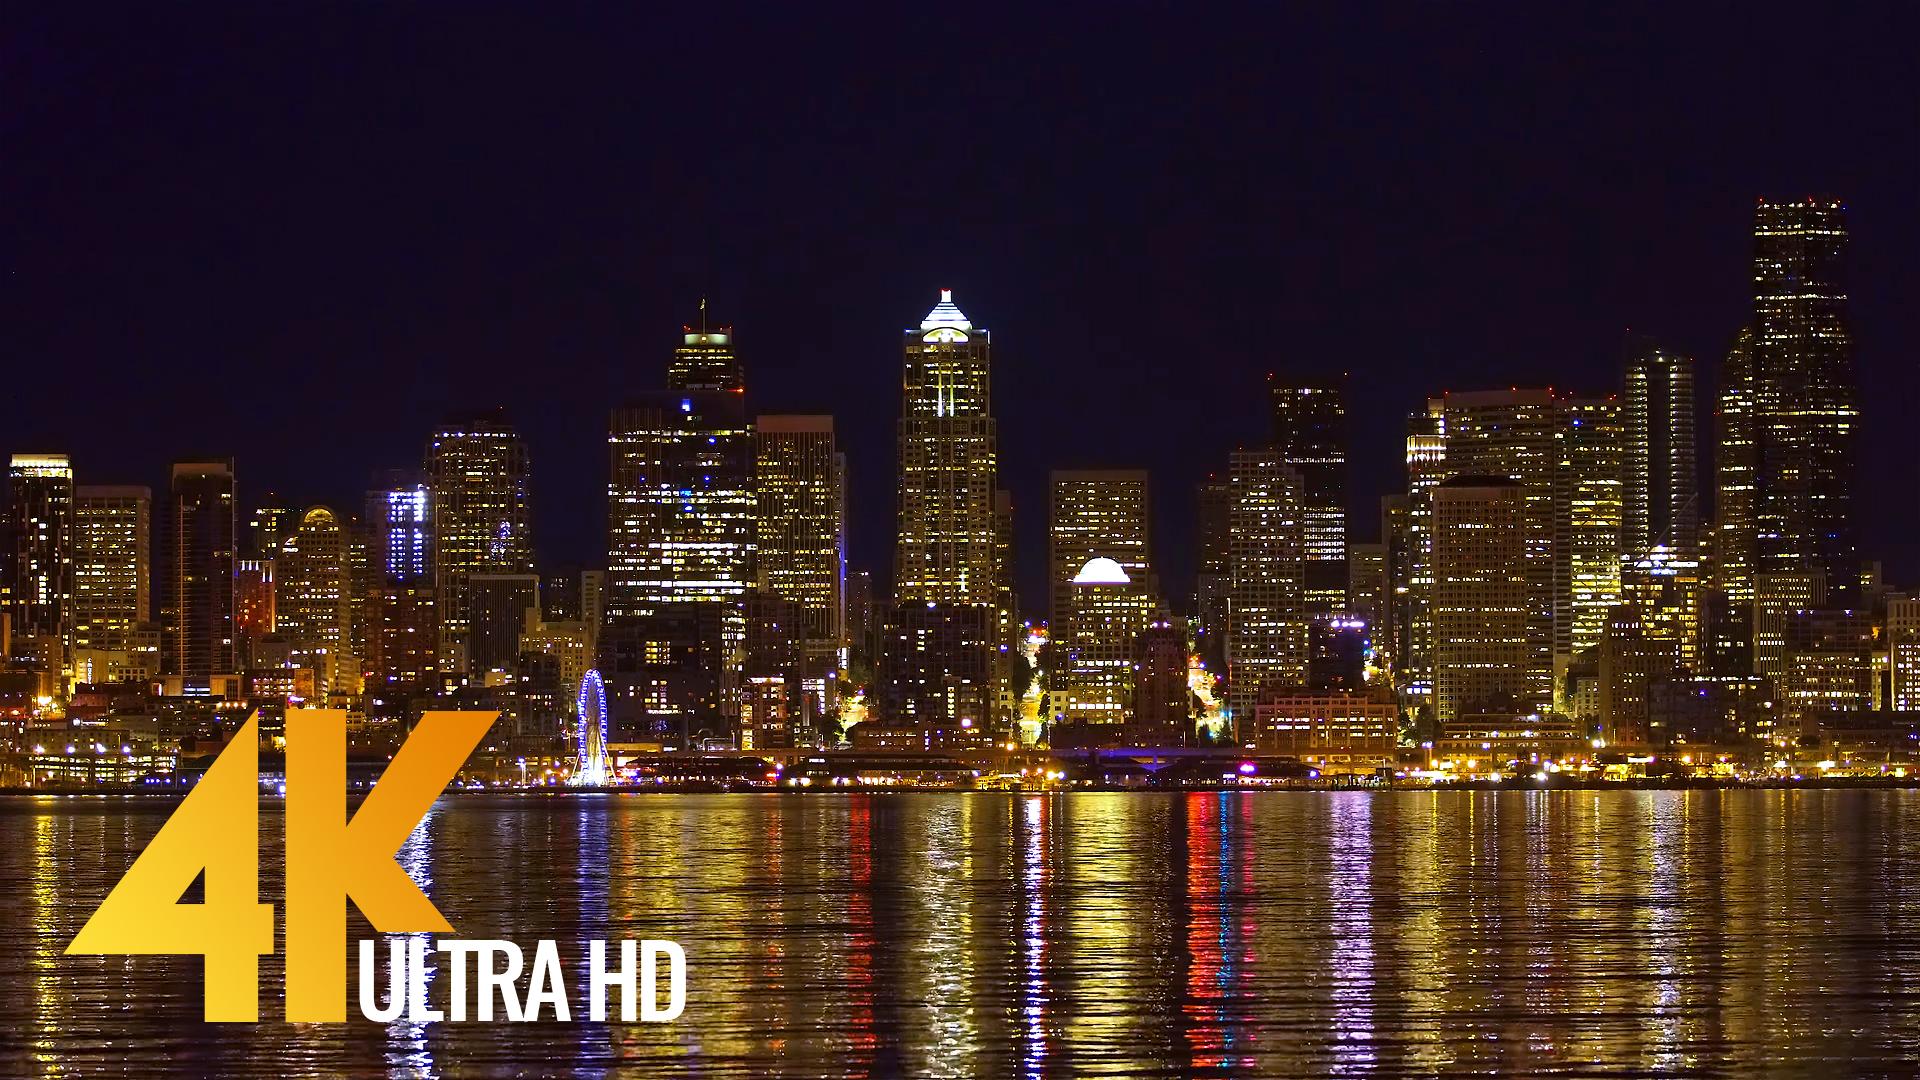 Night Seattle 4k Relax Cityscapes Video Proartinc